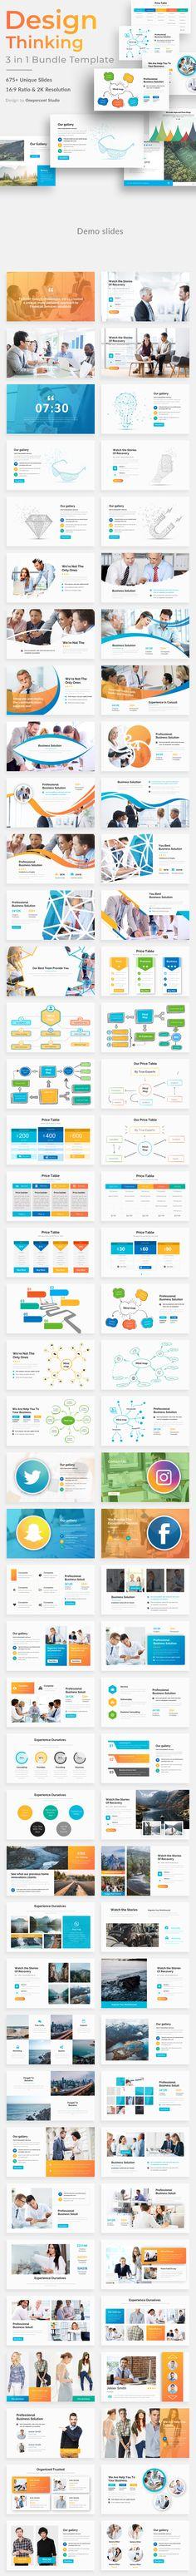 Design Thinking 3 in 1 Pitch Deck Bundle Powerpoint Template Business Powerpoint Presentation, Creative Powerpoint Templates, Design Thinking, Keynote Template, Presentation Design, Web Design, Graphic Design, Deck, Pitch